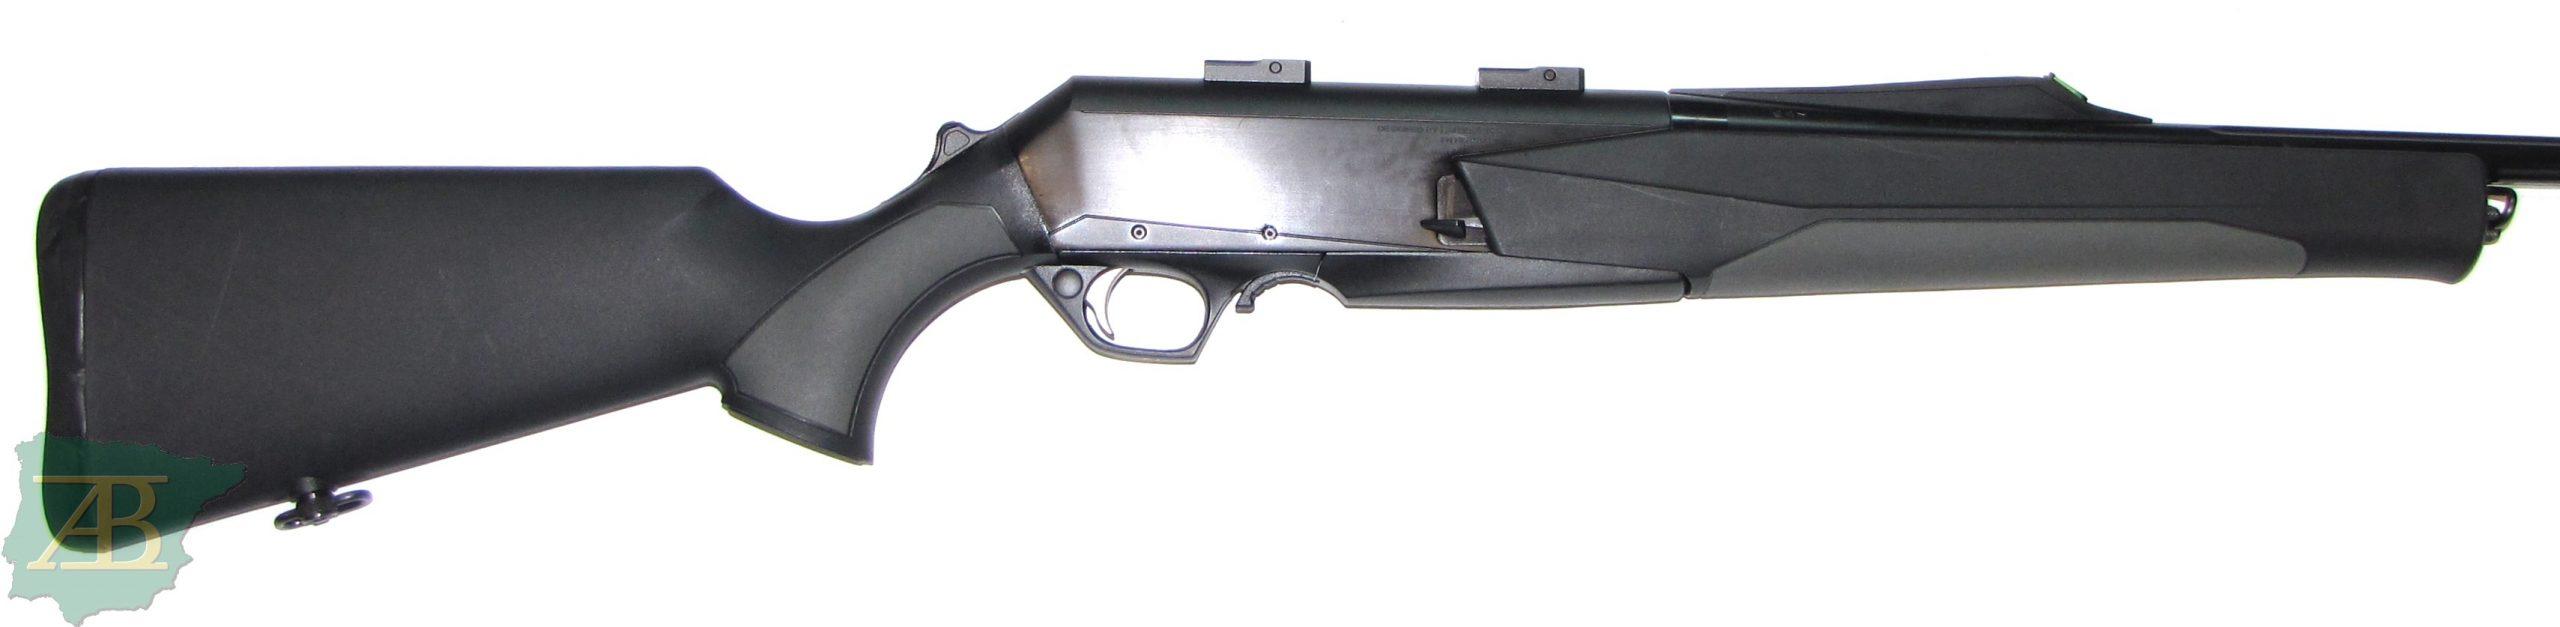 Rifle semiautomático de caza BROWNING MK3 Ref 5599-armeriaiberica-2